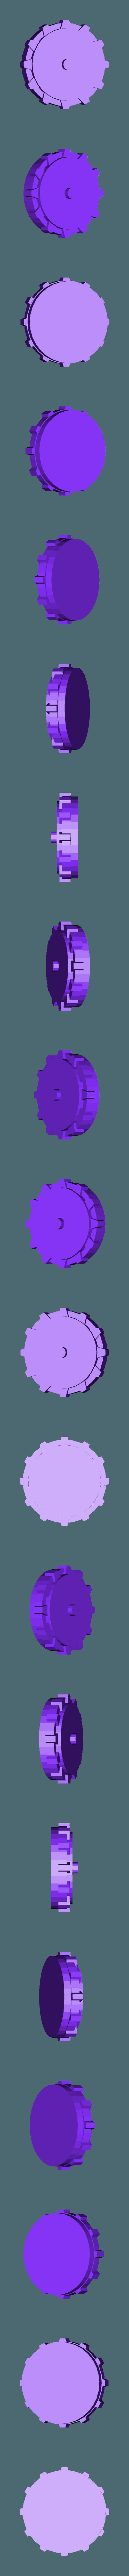 mk_d-4lt_pc_tower_cap.stl Download free STL file Big Plasma Cannon Turret • 3D printing design, JtStrait72